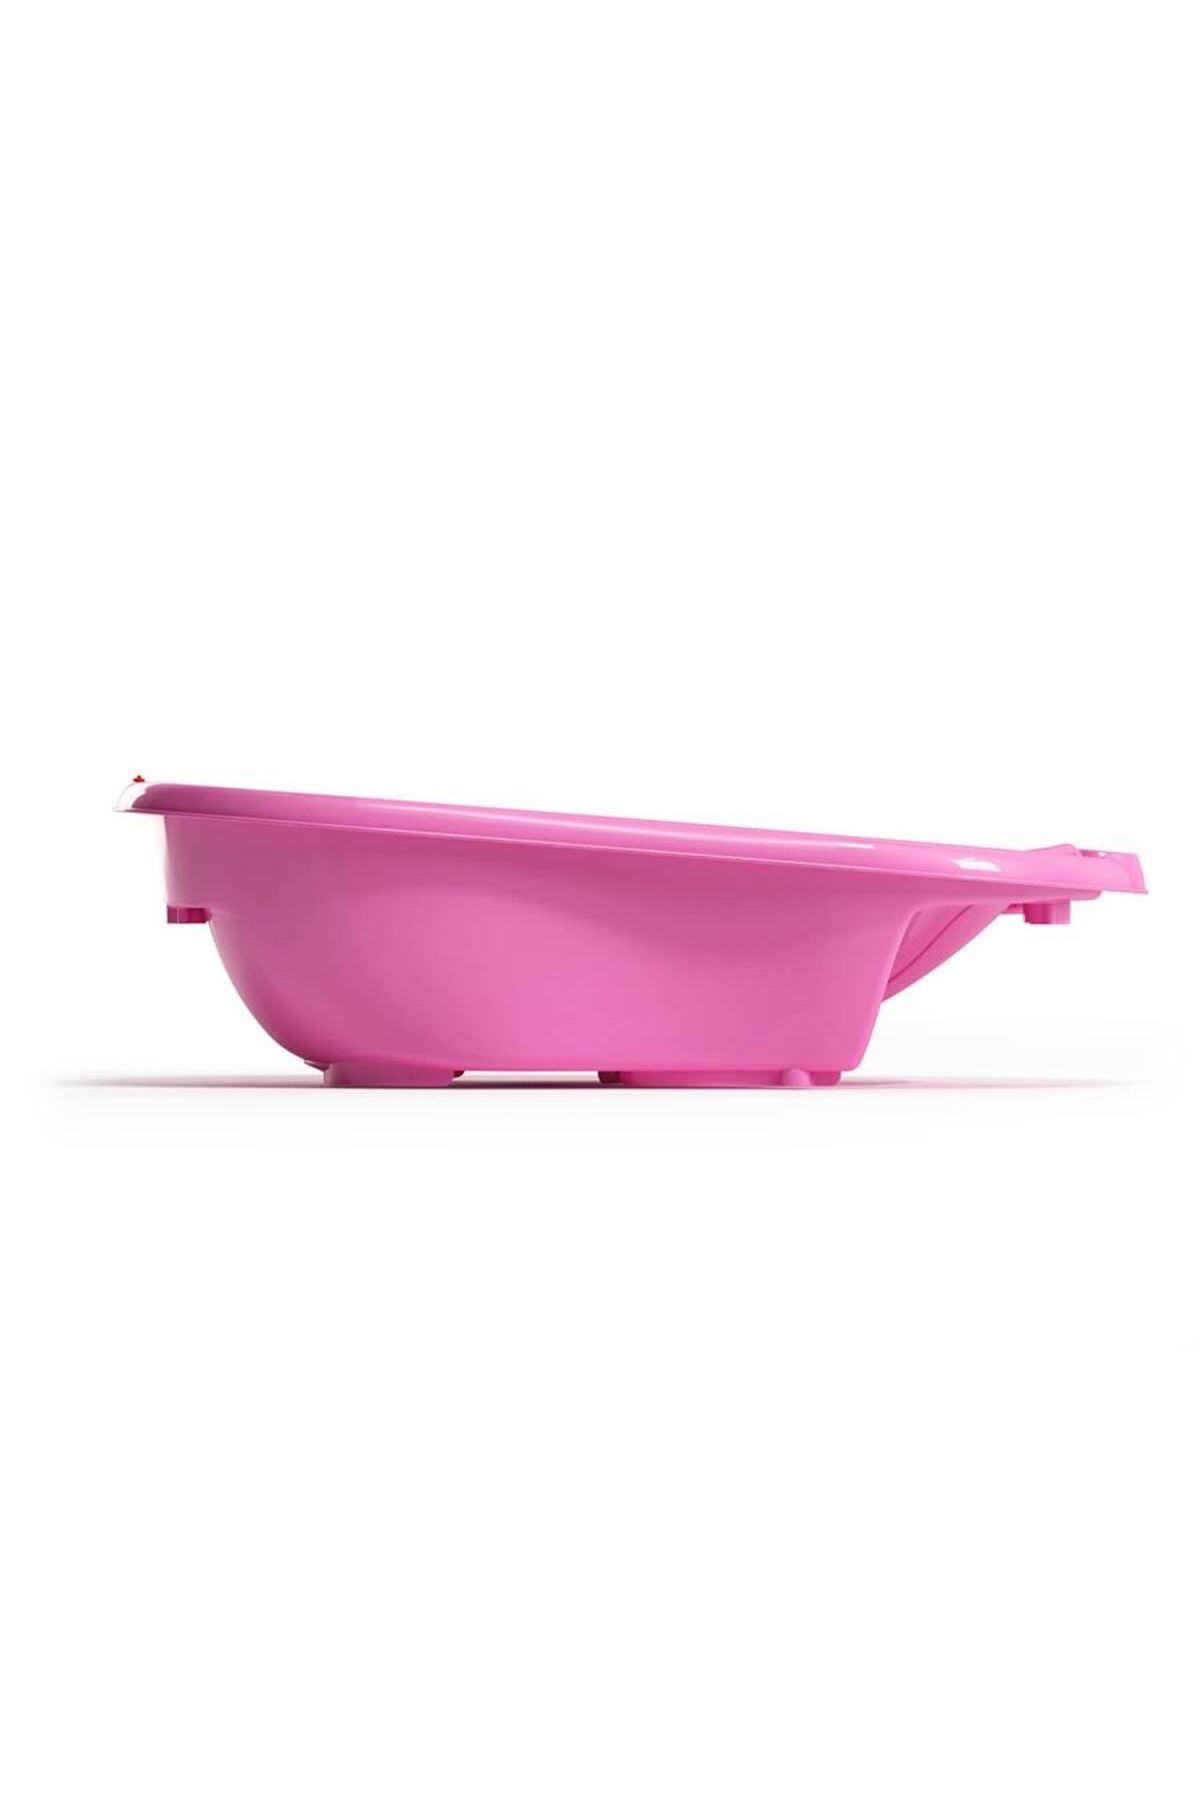 OkBaby Onda Banyo Küveti / Canlı Pembe